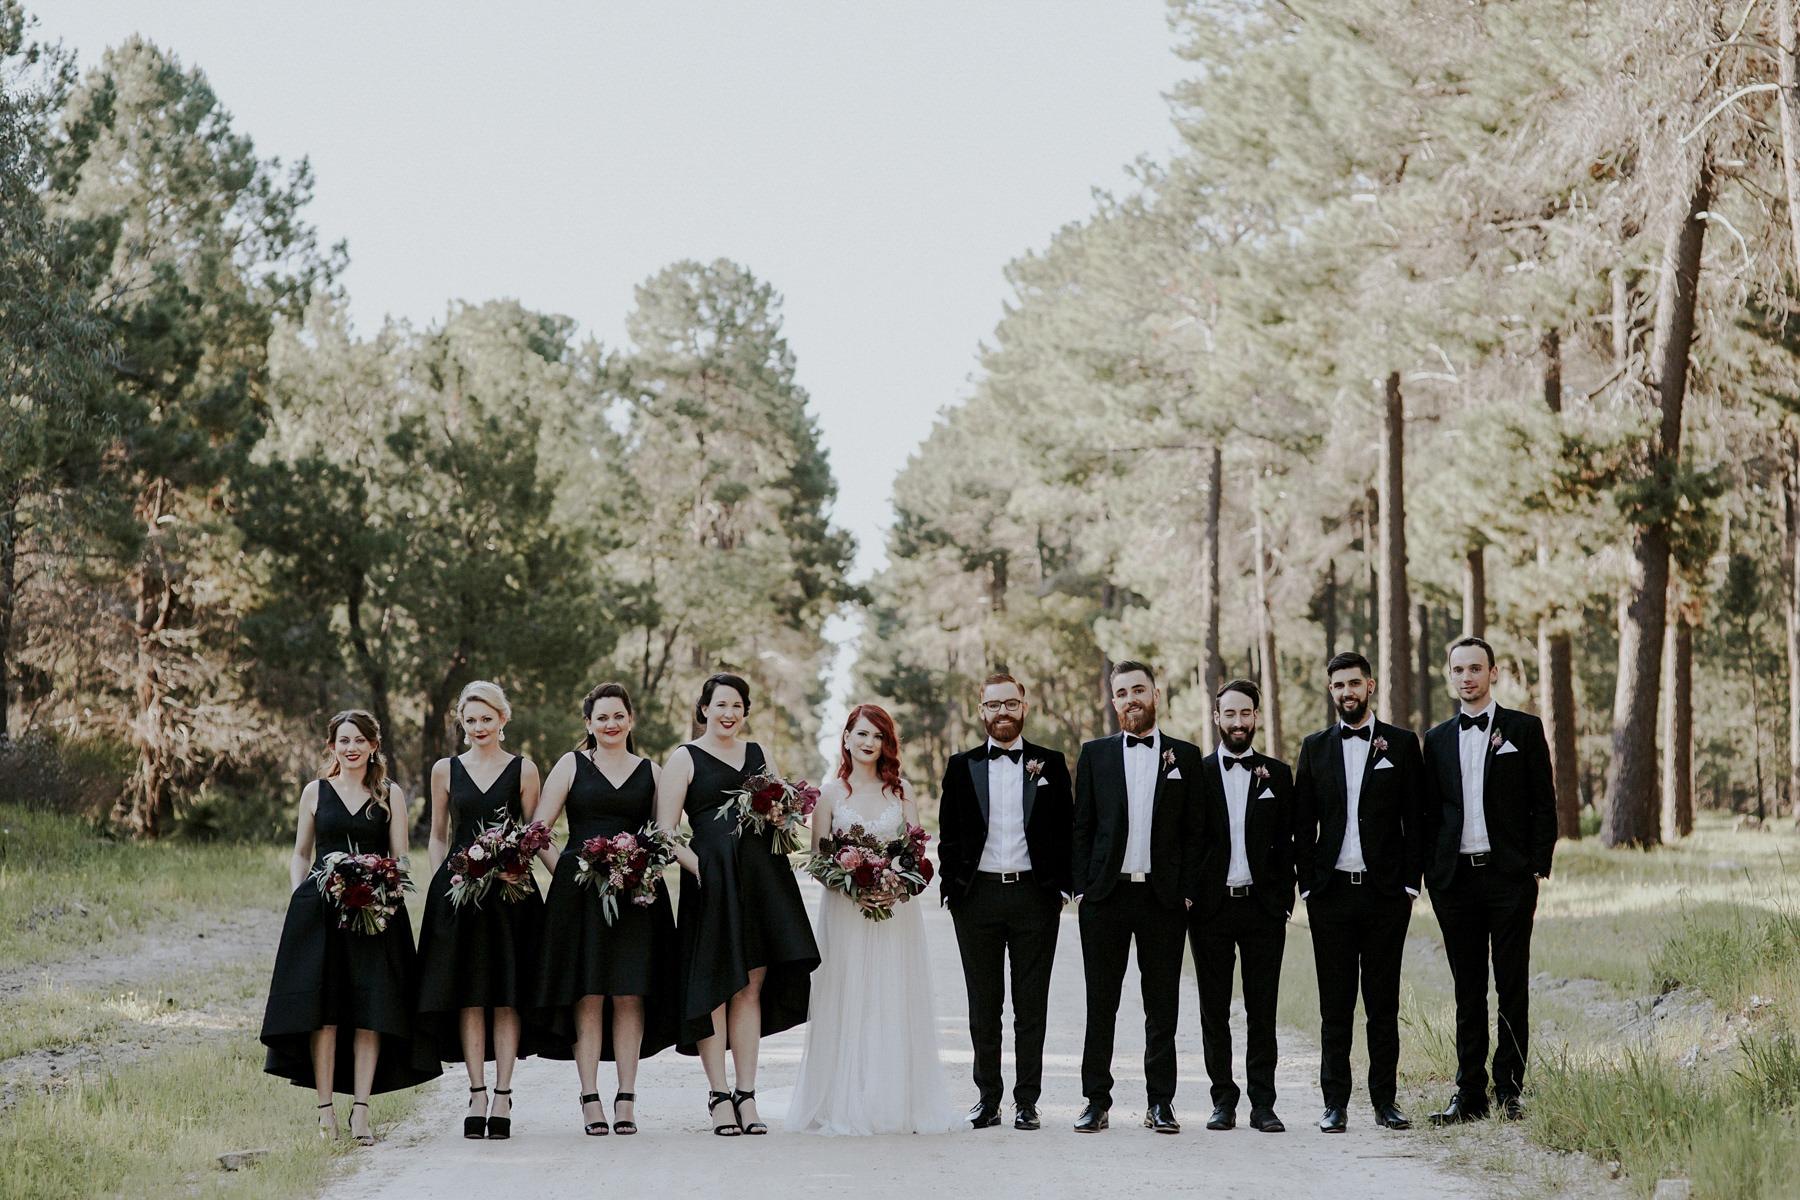 flour-factory-wedding_perth-city-wedding-099